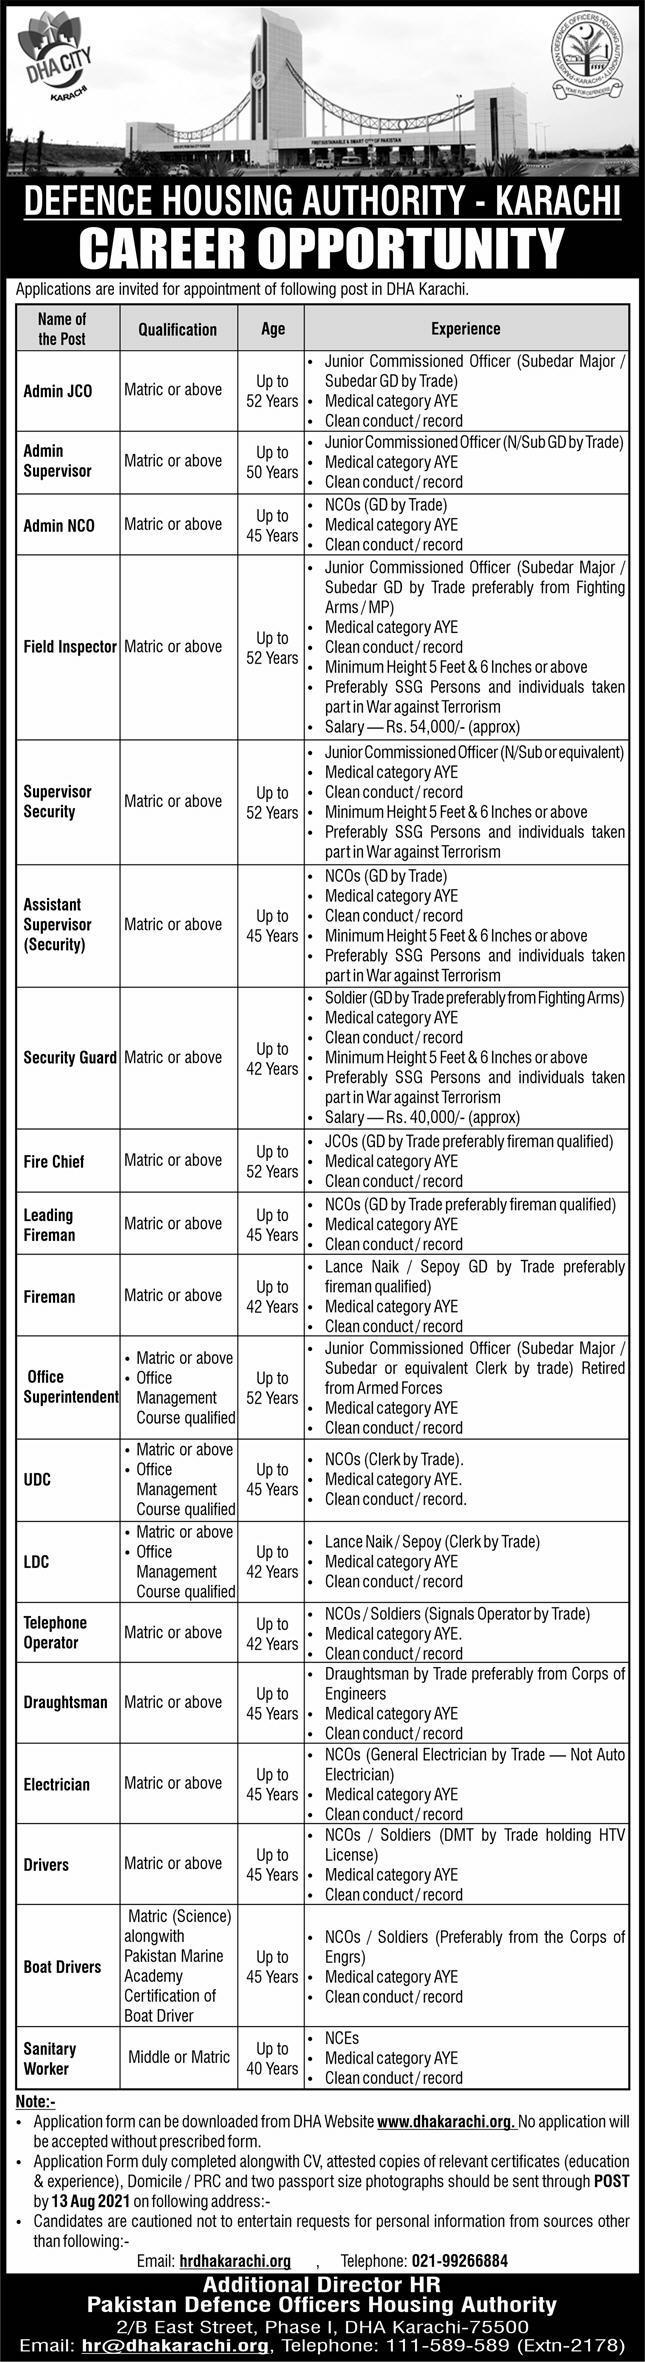 Defence Housing Authority Karachi Jobs August 2021